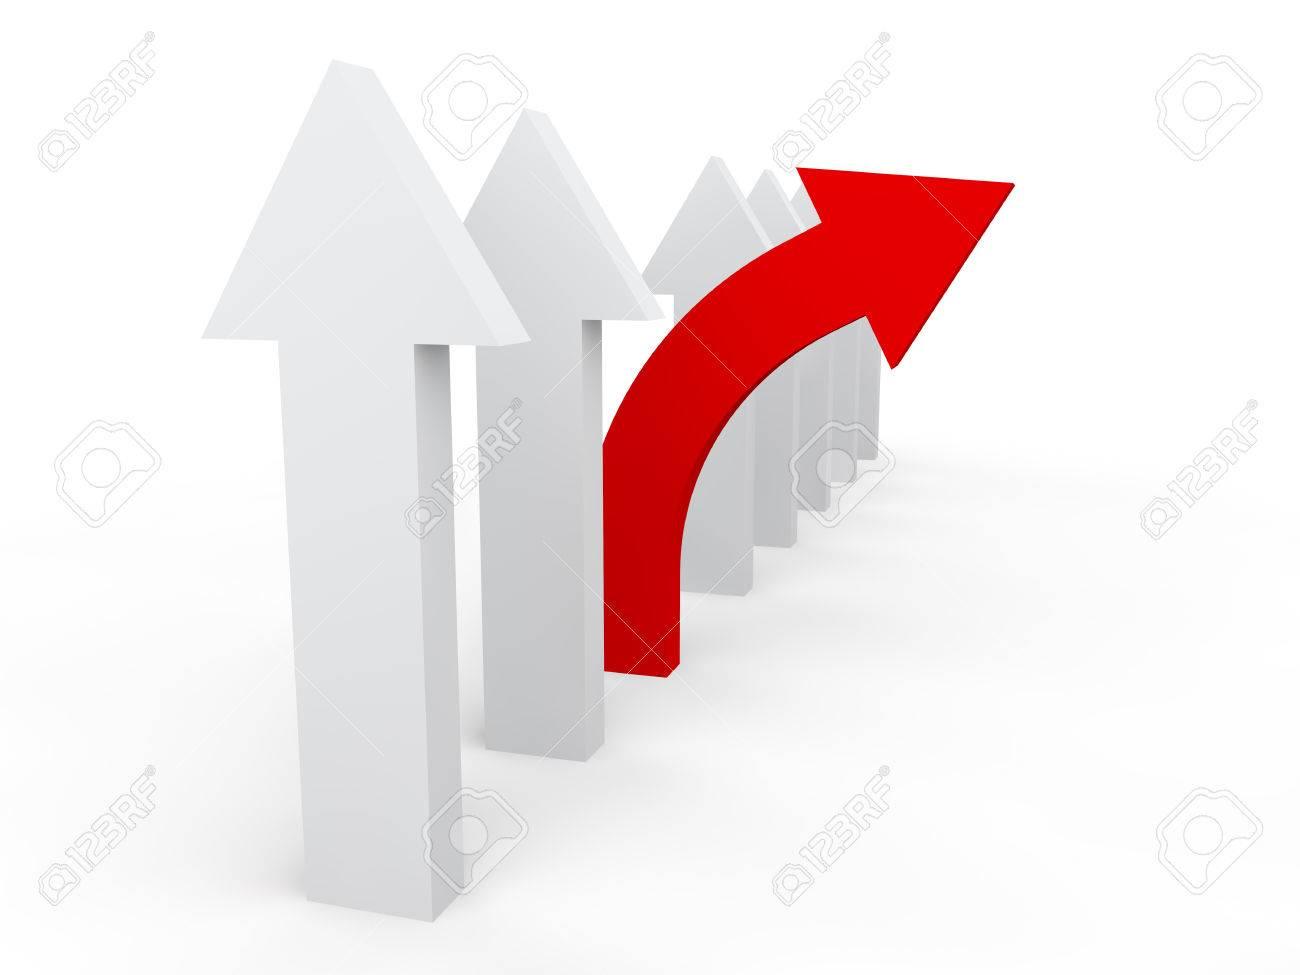 3d unique deviating arrow in a row - 47107117